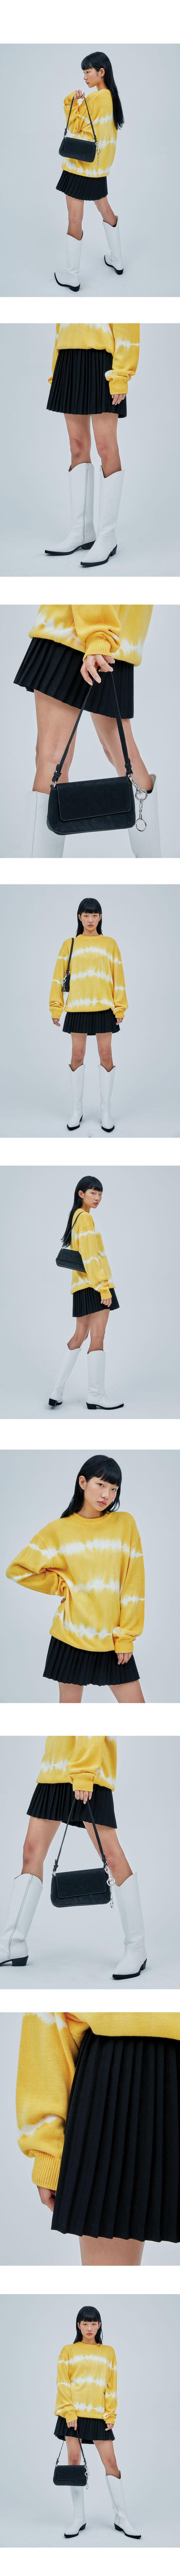 accordion pleats skirt - woman